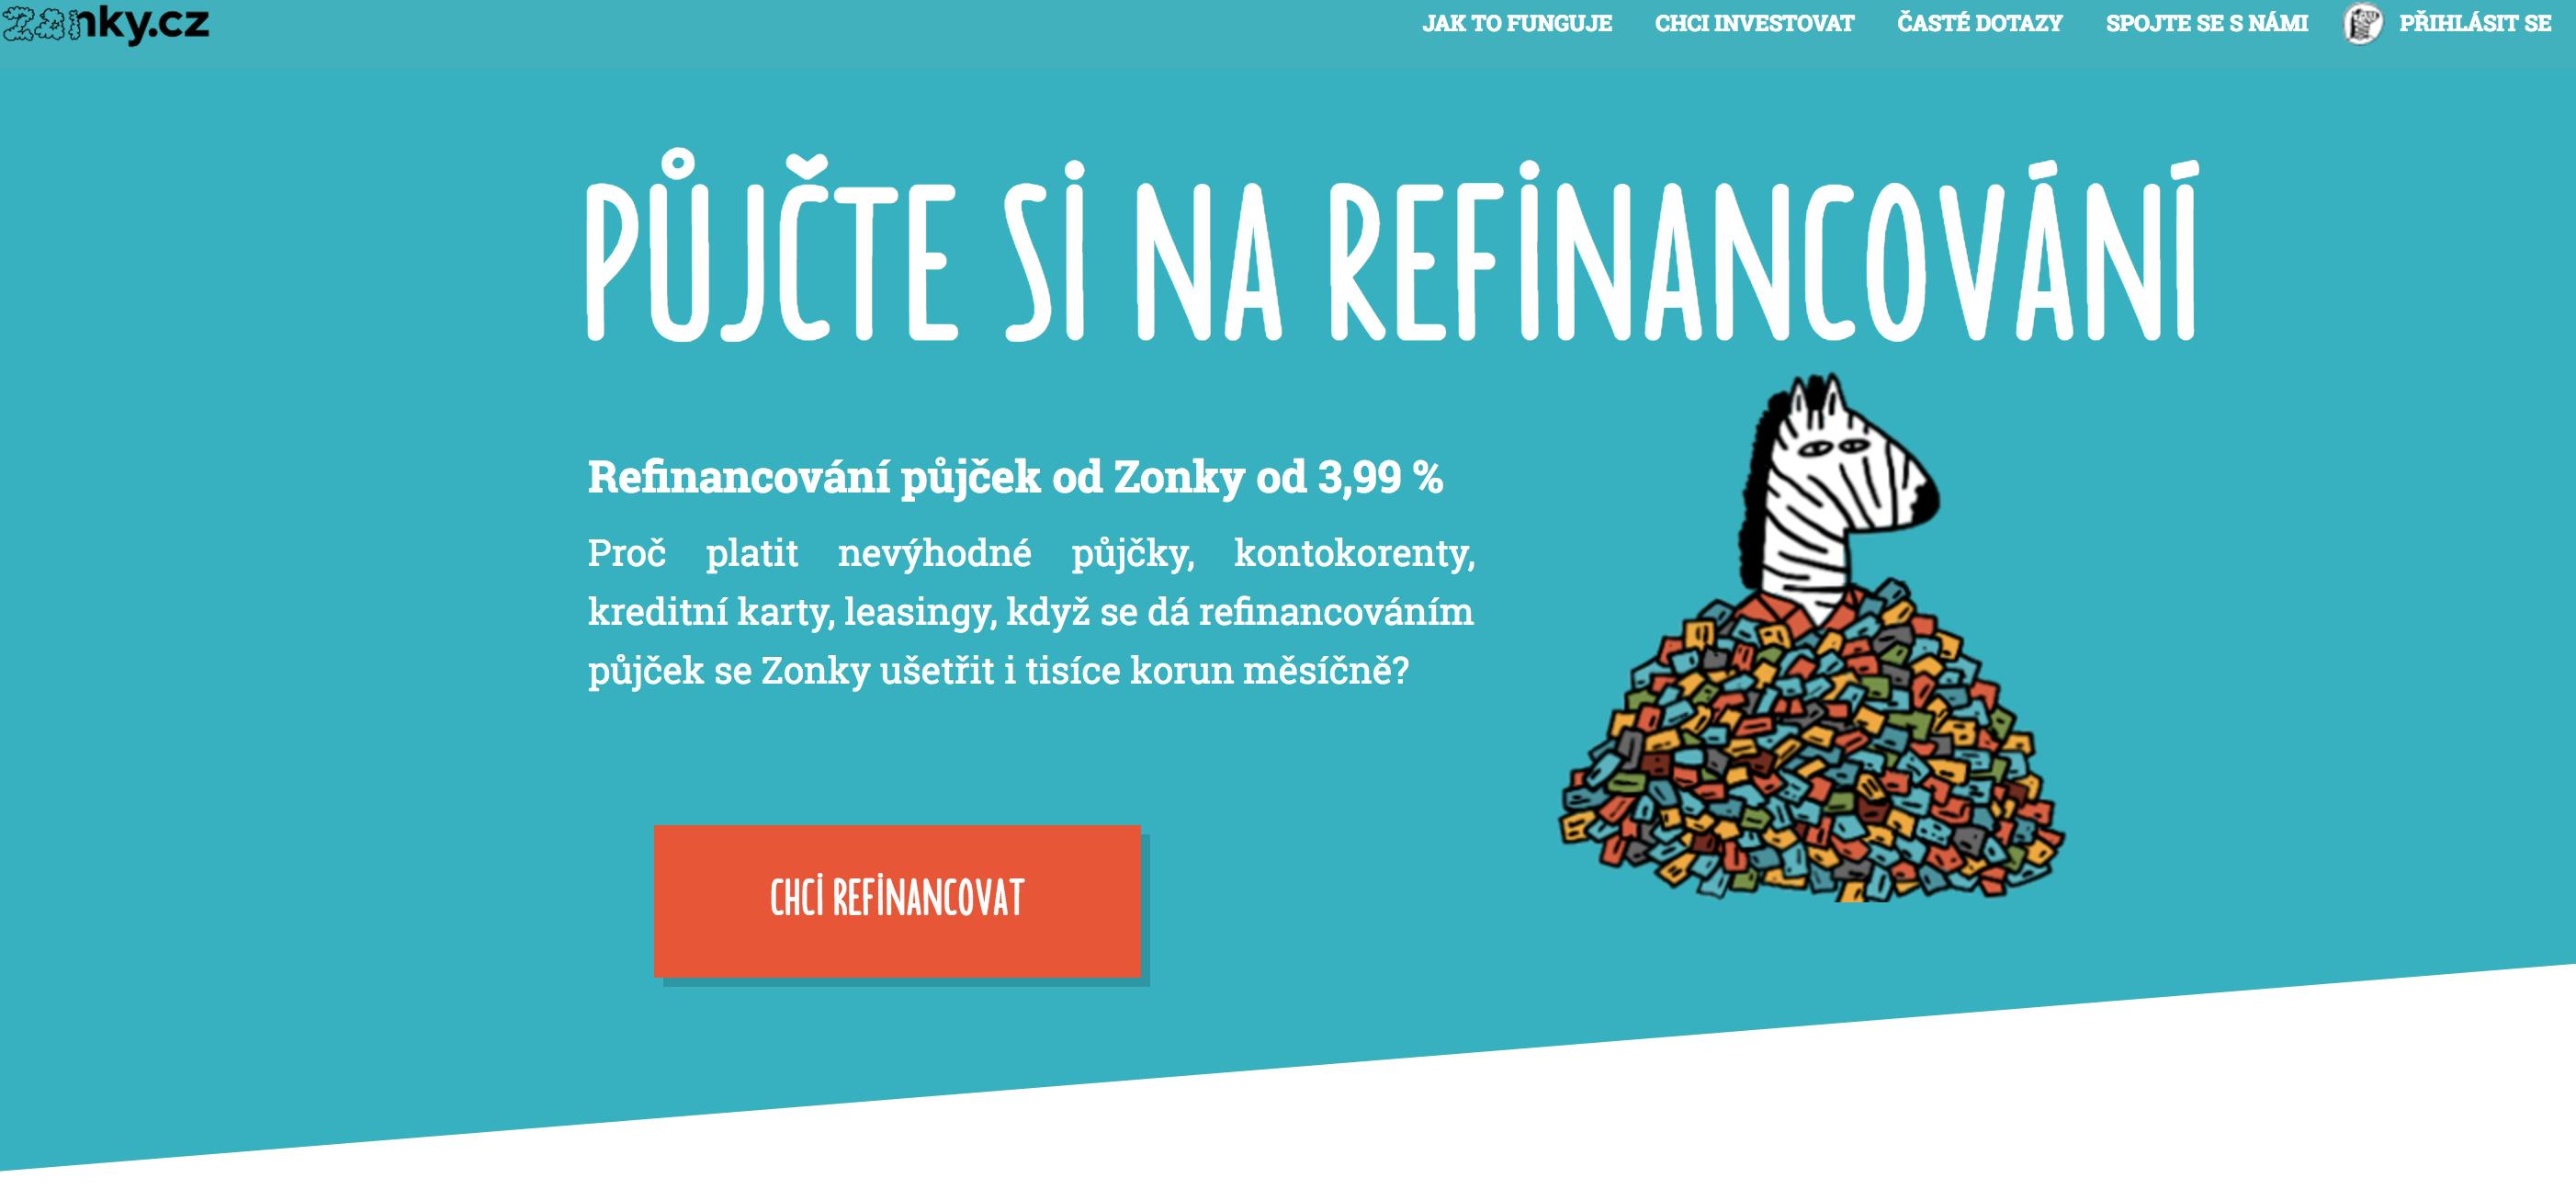 Online nové pujcky pred výplatou havířov cena